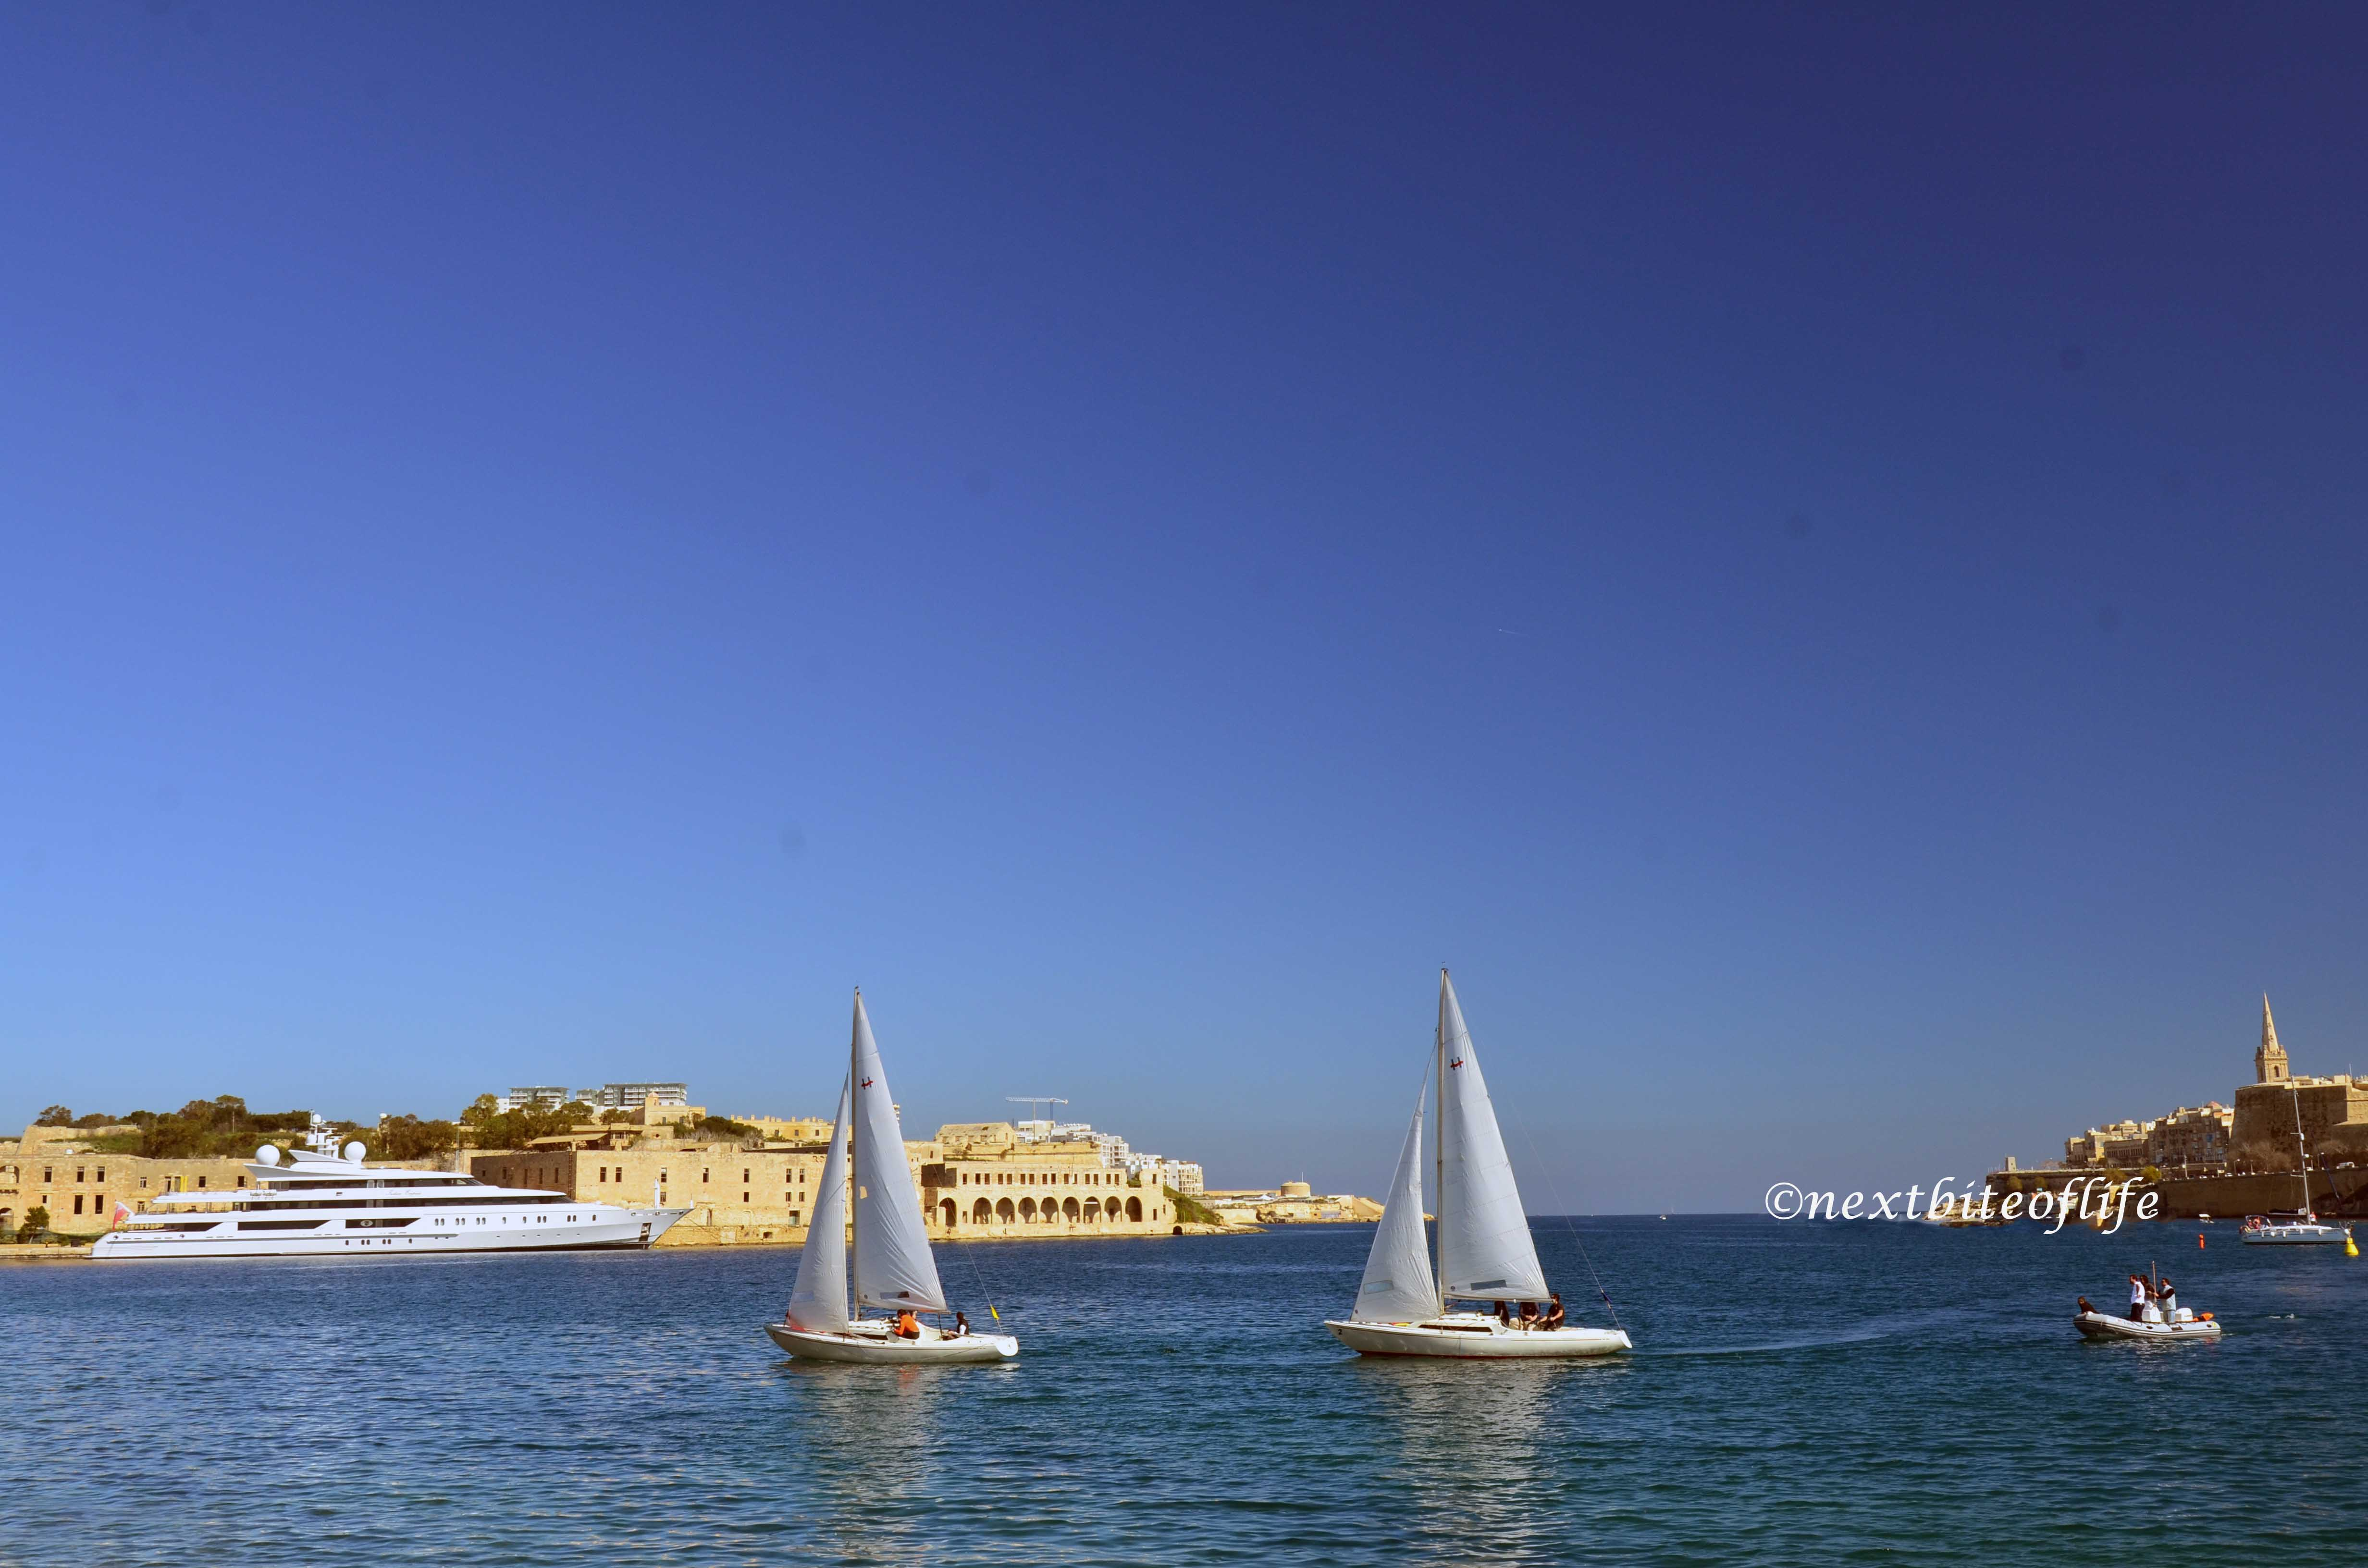 It's a beautiful day in my Malta neighborhood…